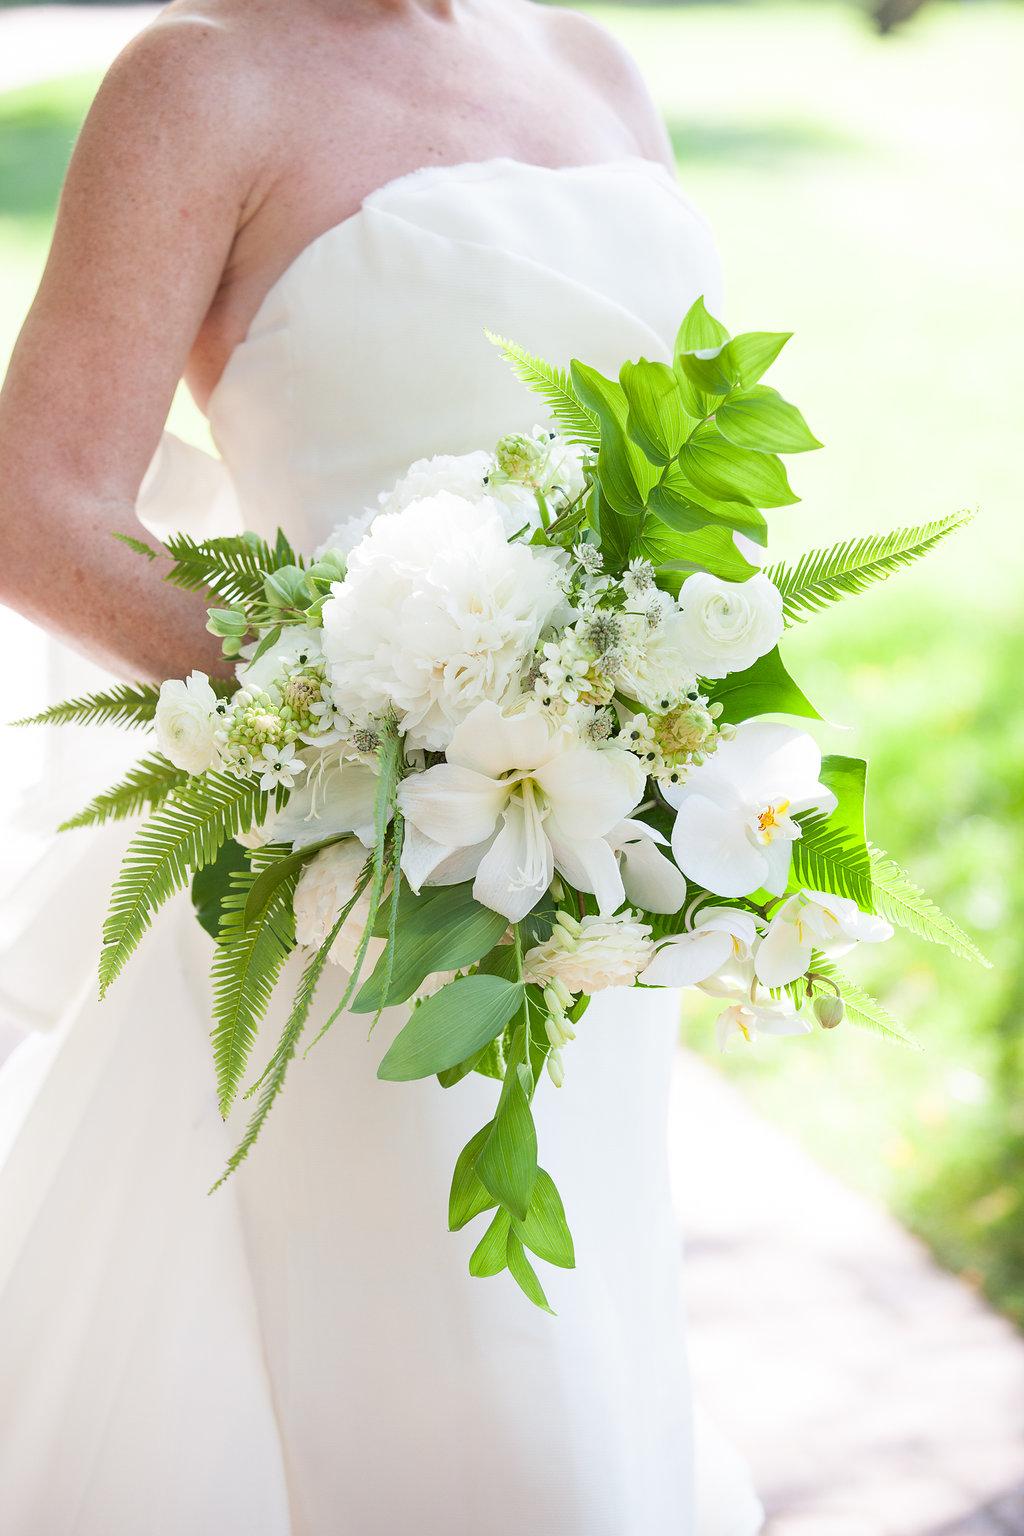 www.santabarbarawedding.com | Melissa Musgrove Photography | Four Seasons Resort The Biltmore | Bridal Bouquet